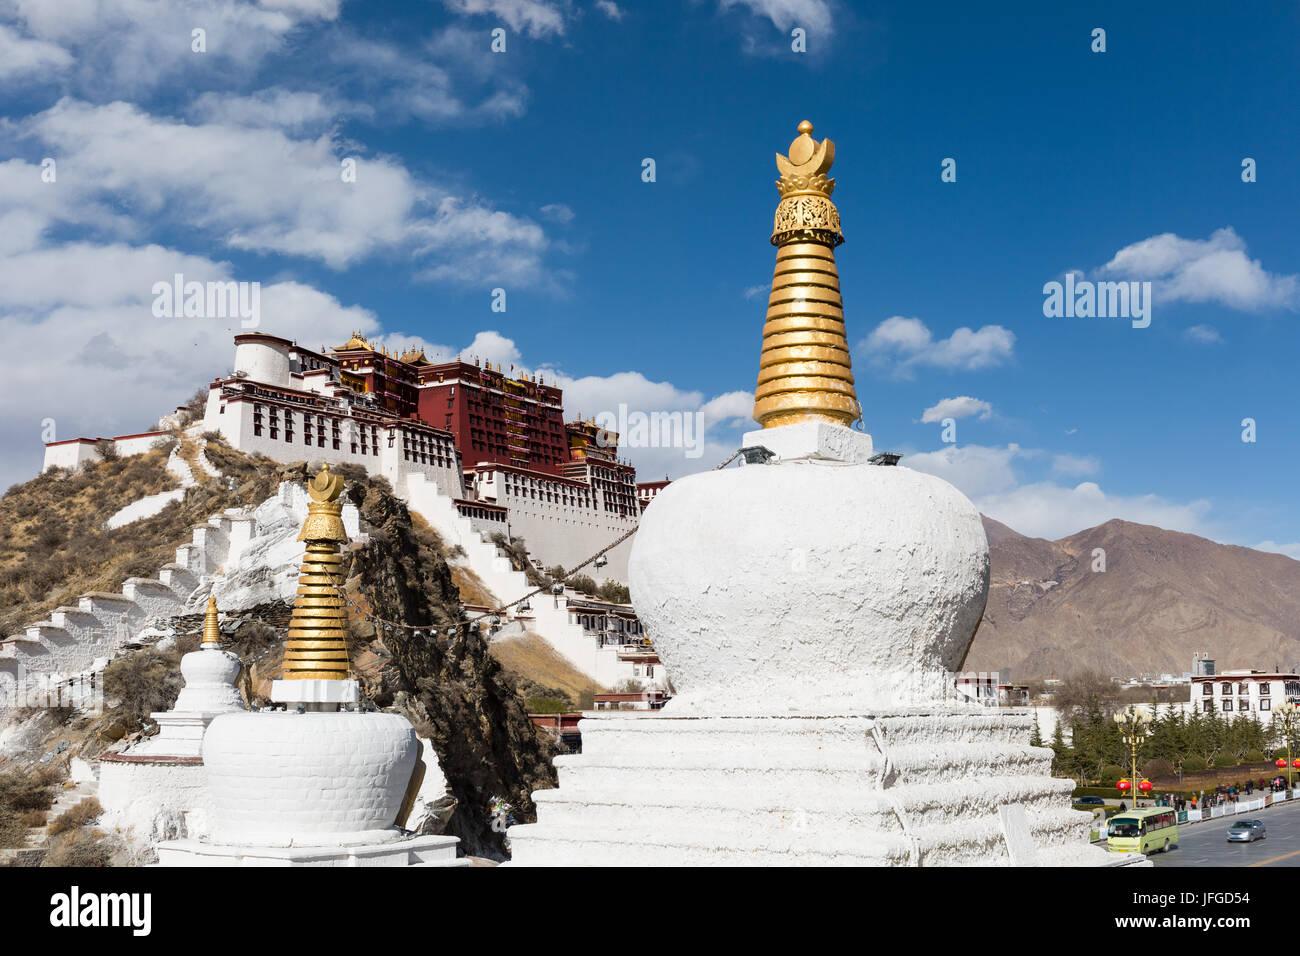 potala palace in lhasa - Stock Image